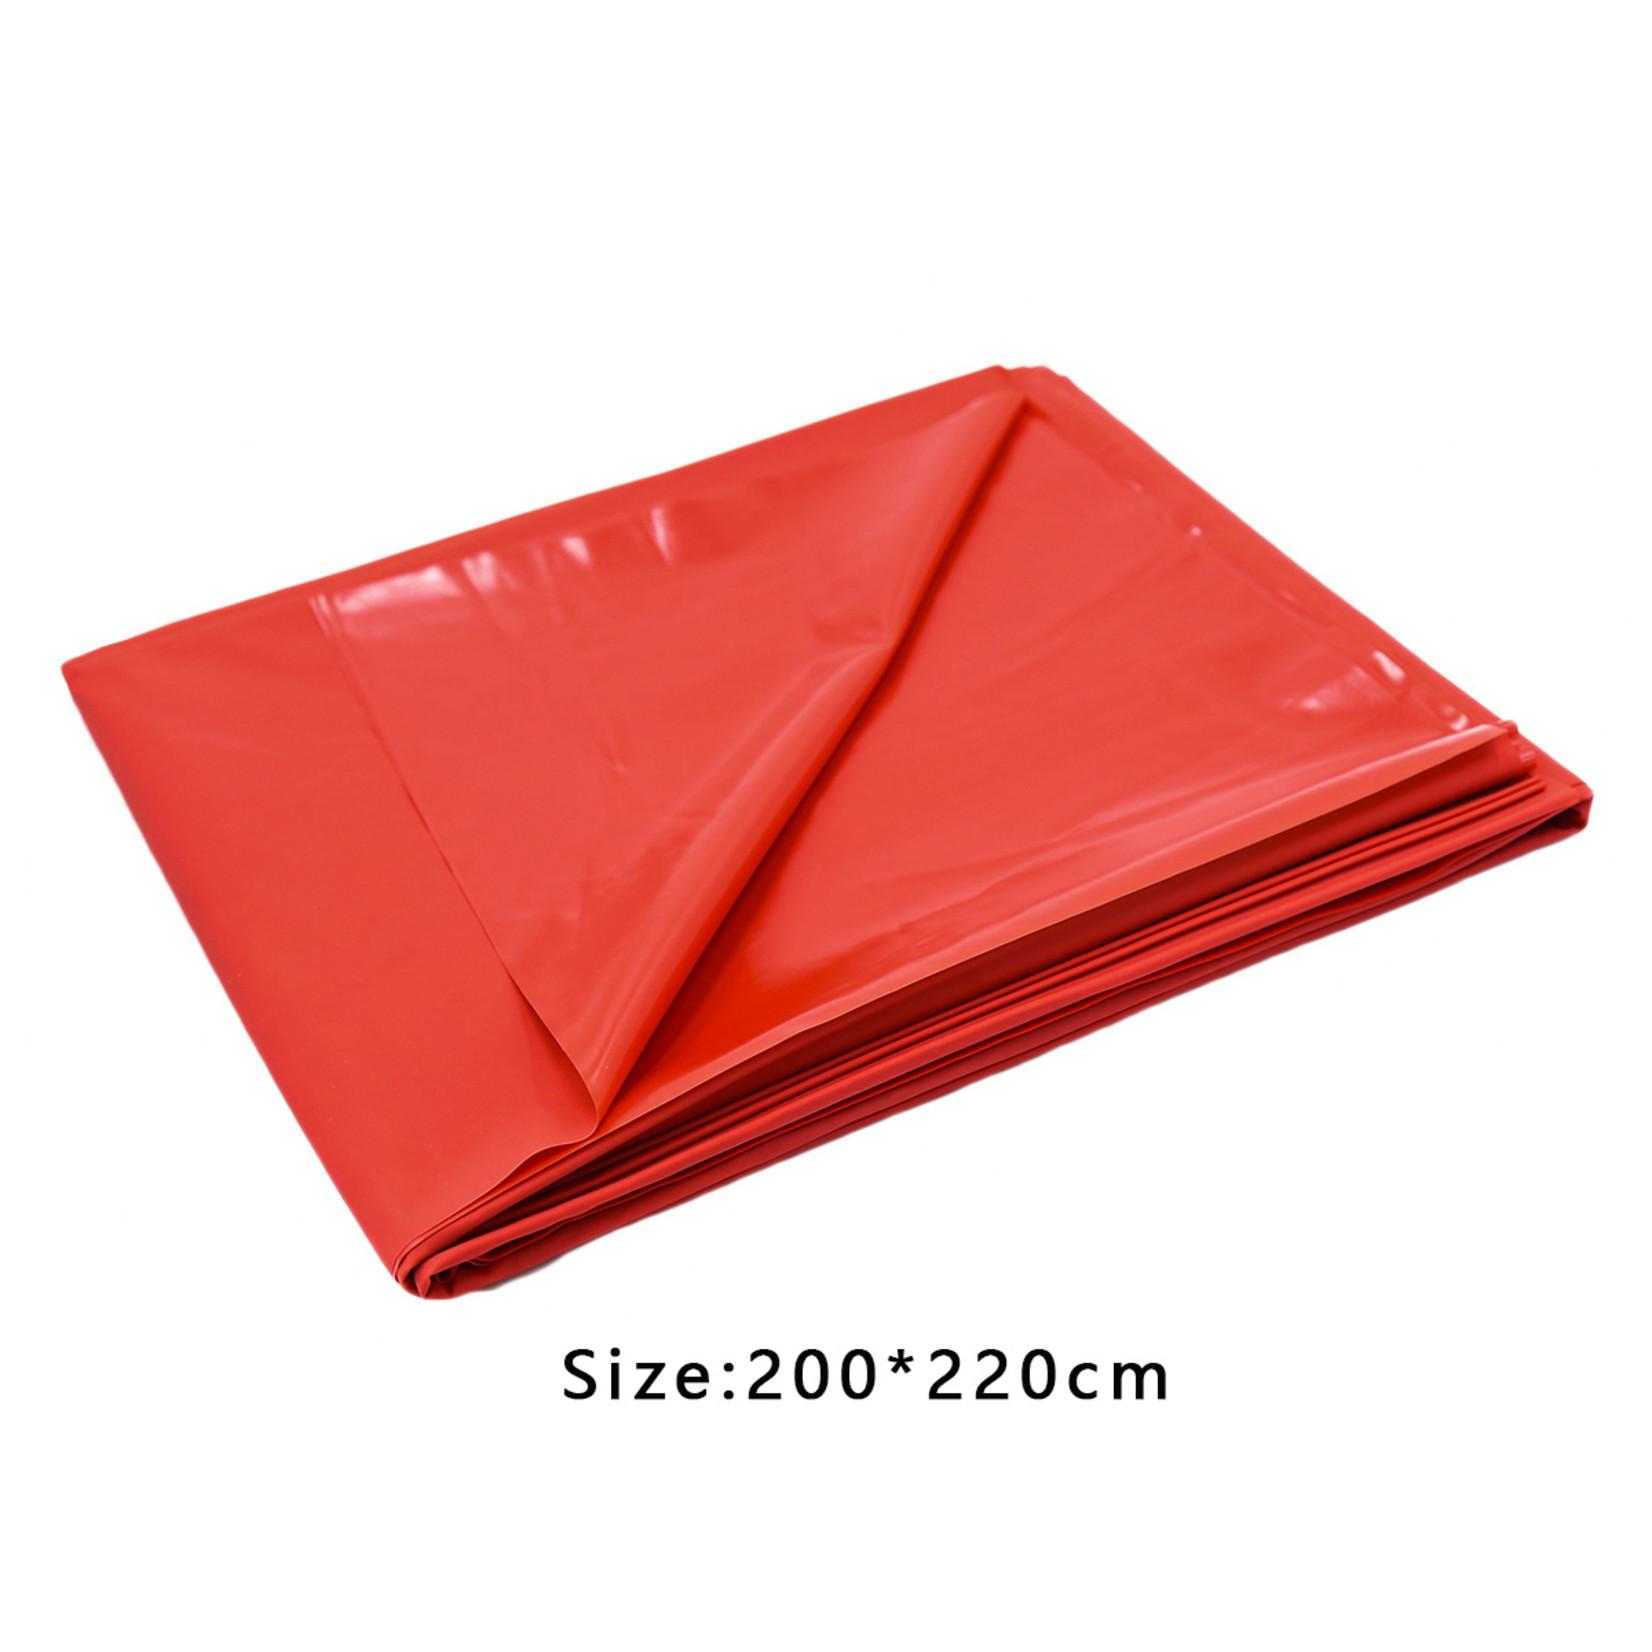 KIOTOS Bed Sheet Cover Red